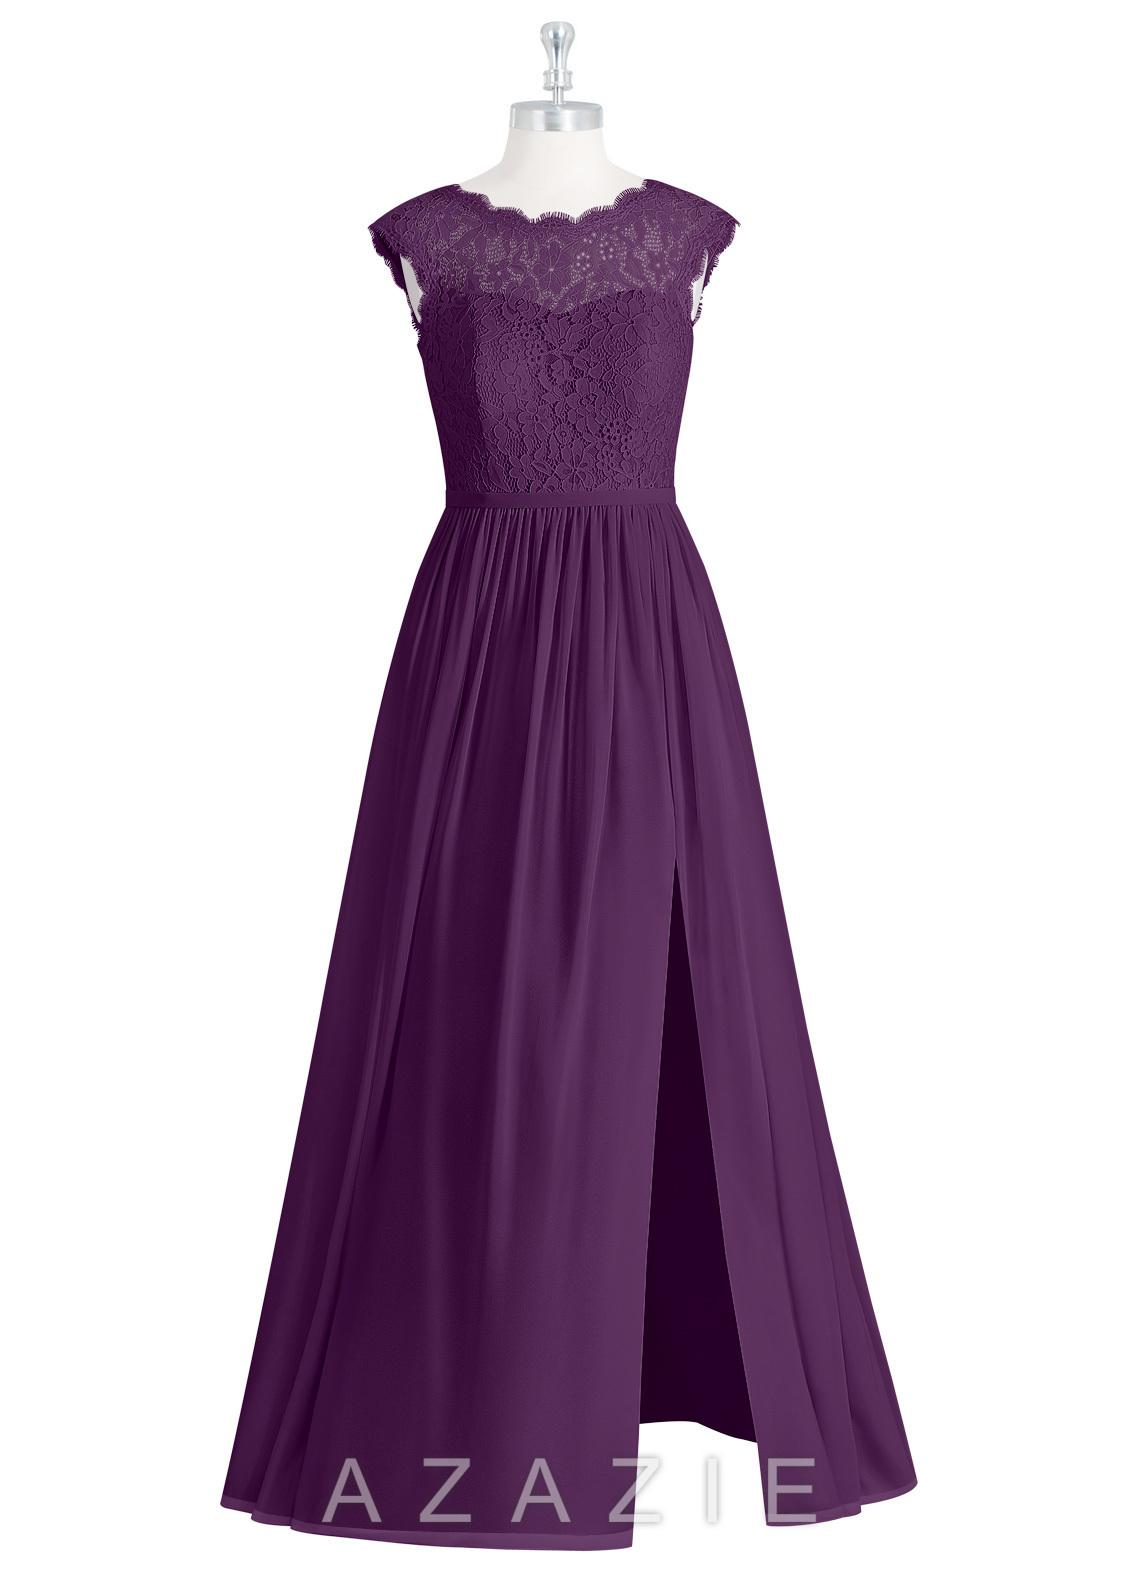 Azazie Arden Bridesmaid Dress | Azazie